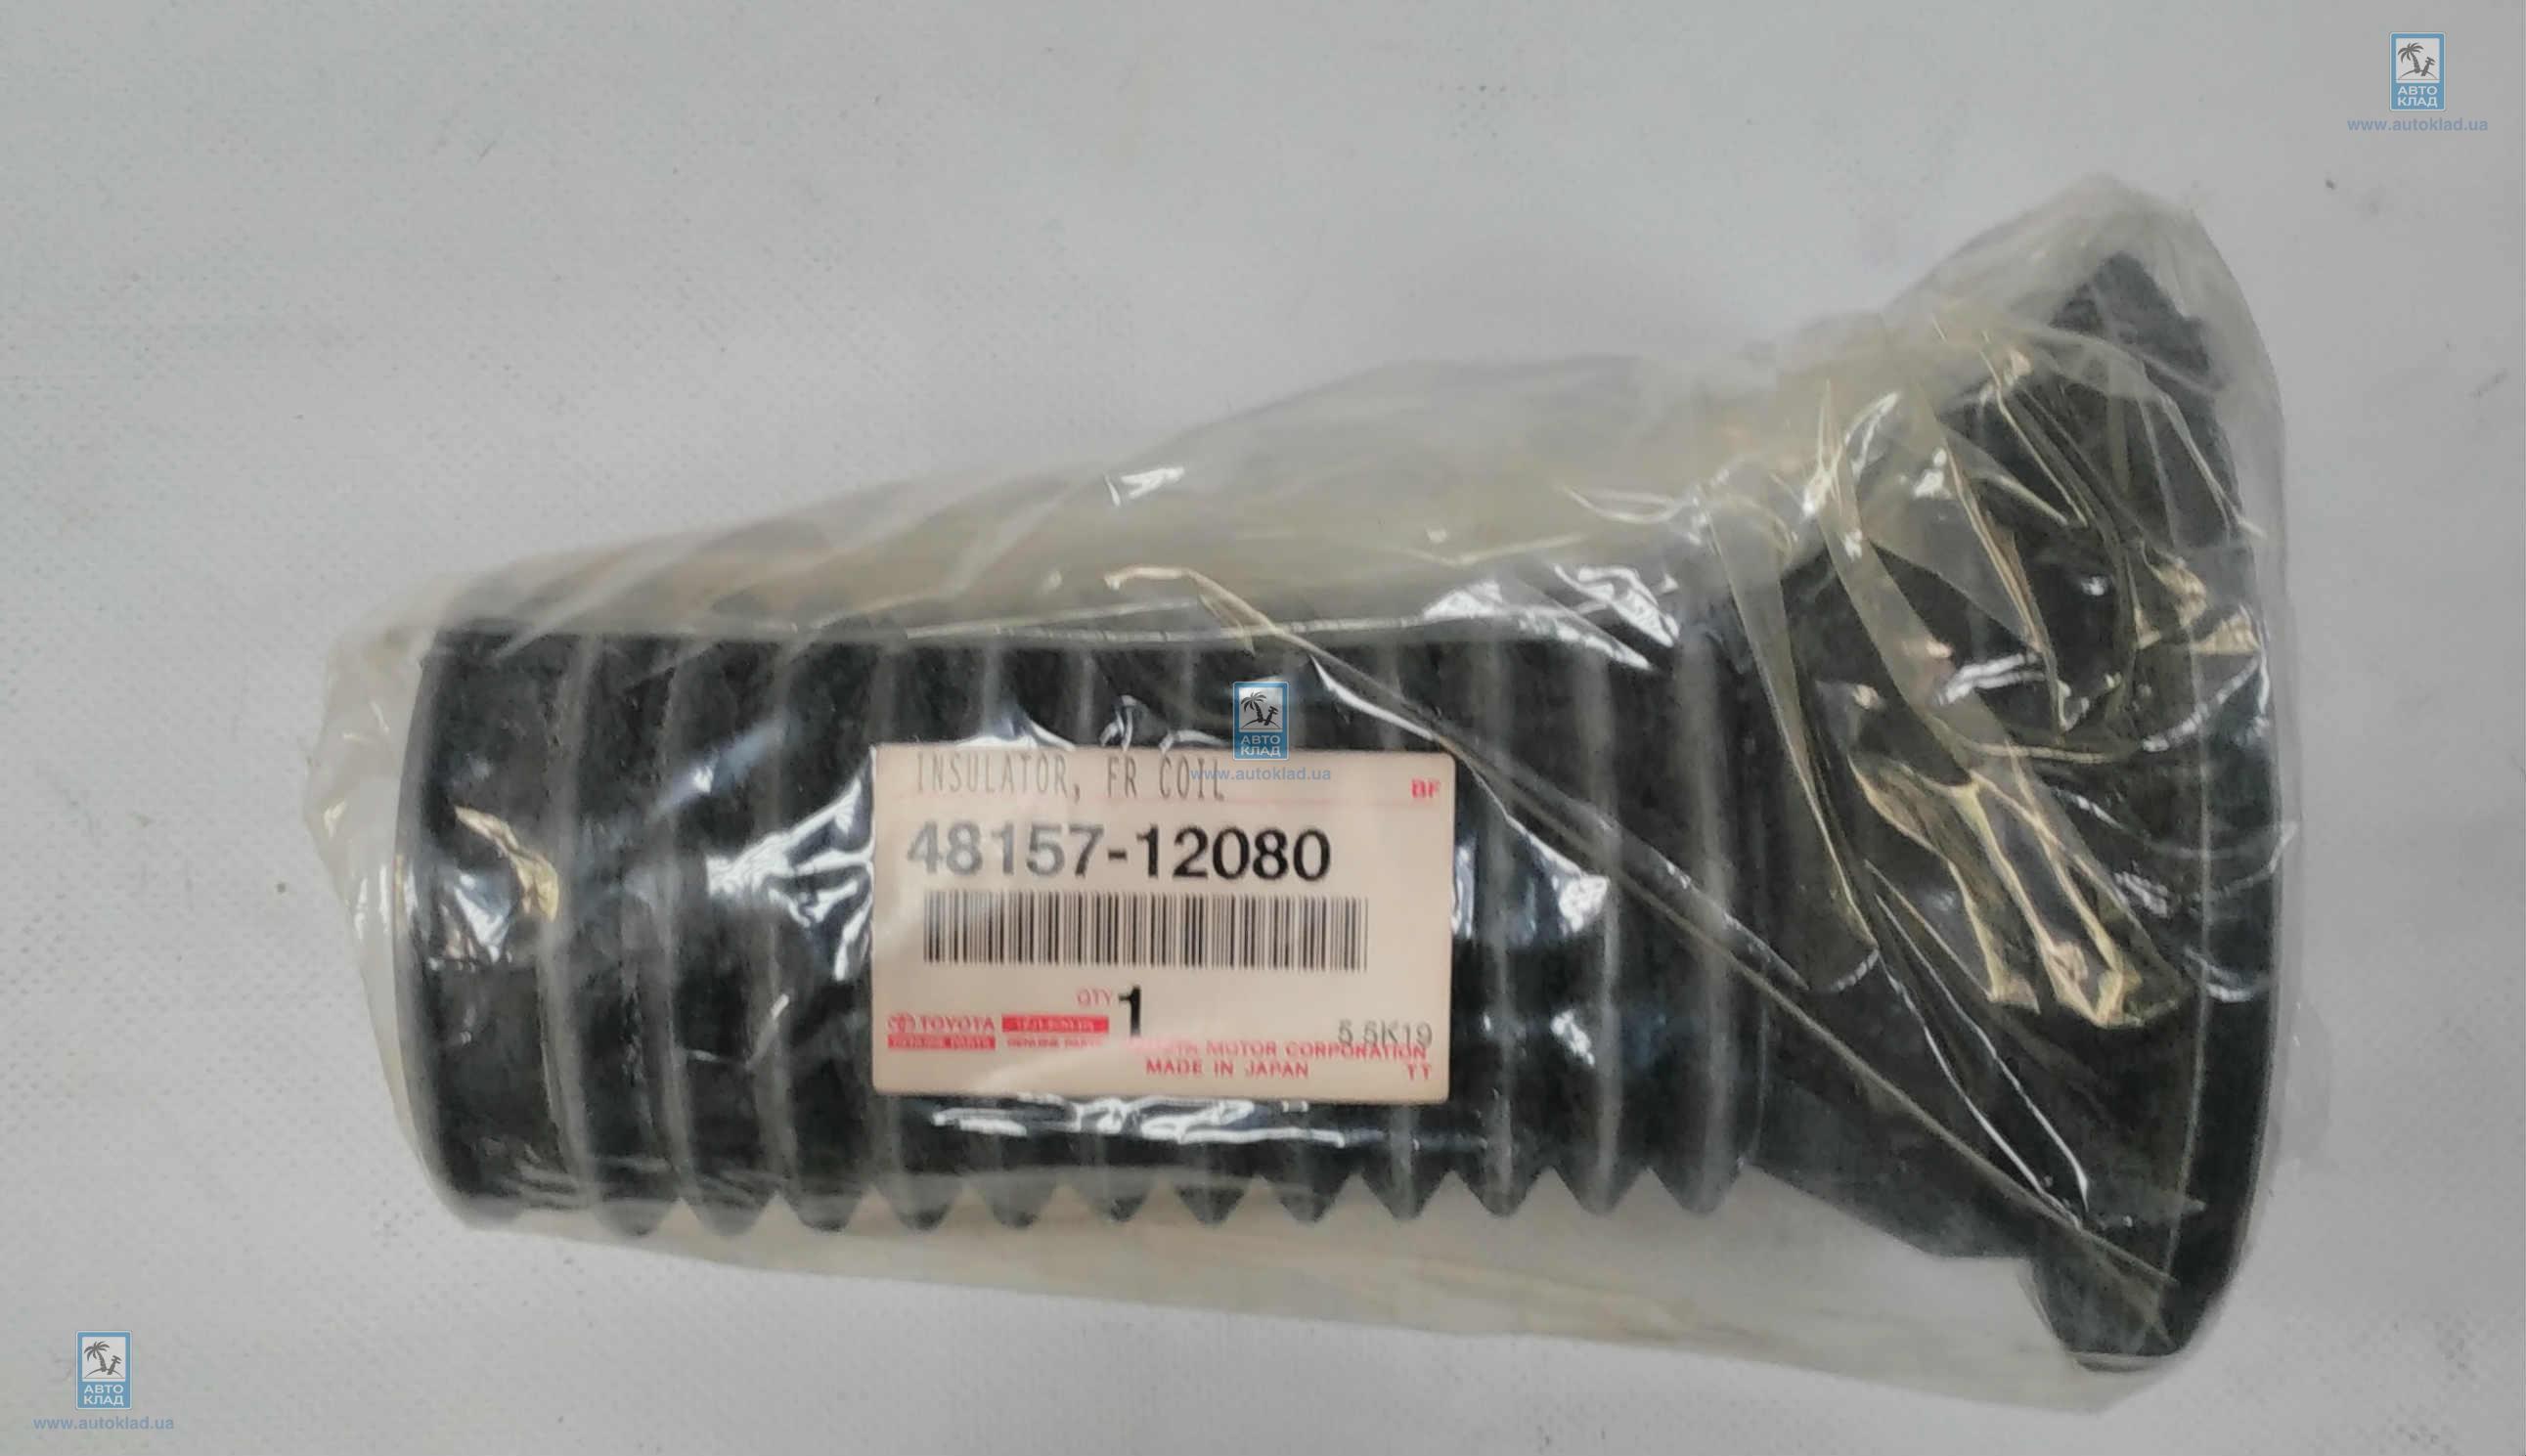 Пыльник амортизатора TOYOTA 48157-12080